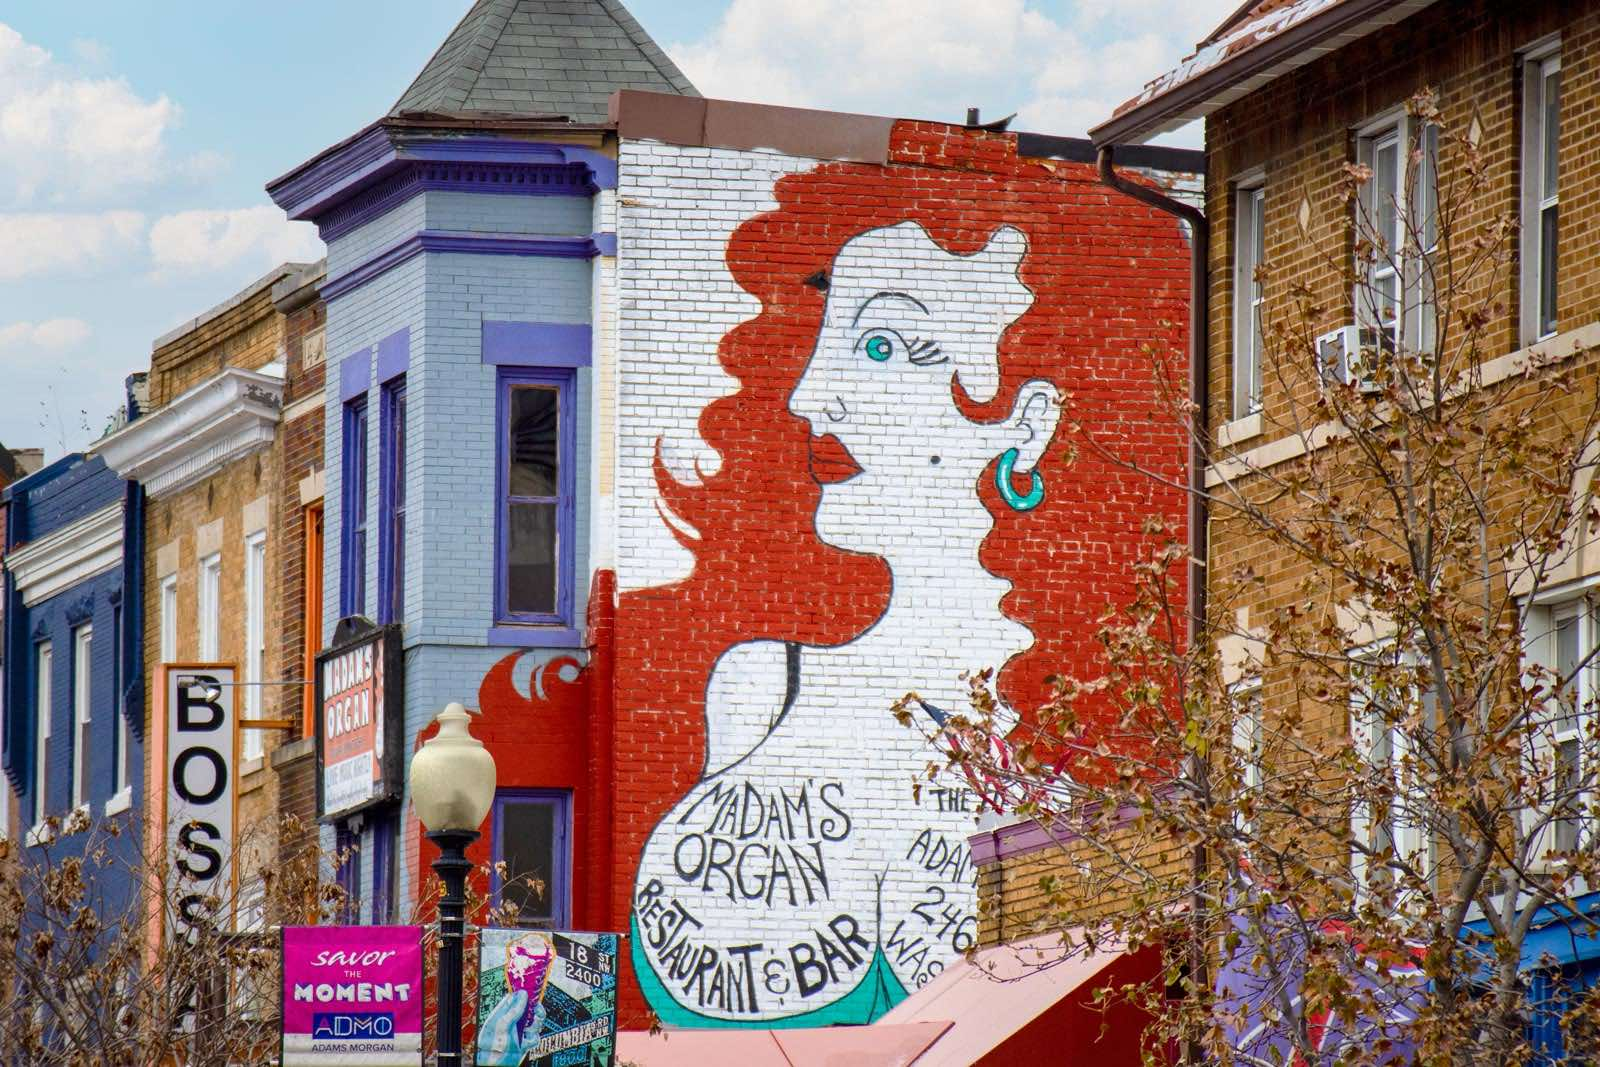 Madam's Organ Blues Bar is a local landmark